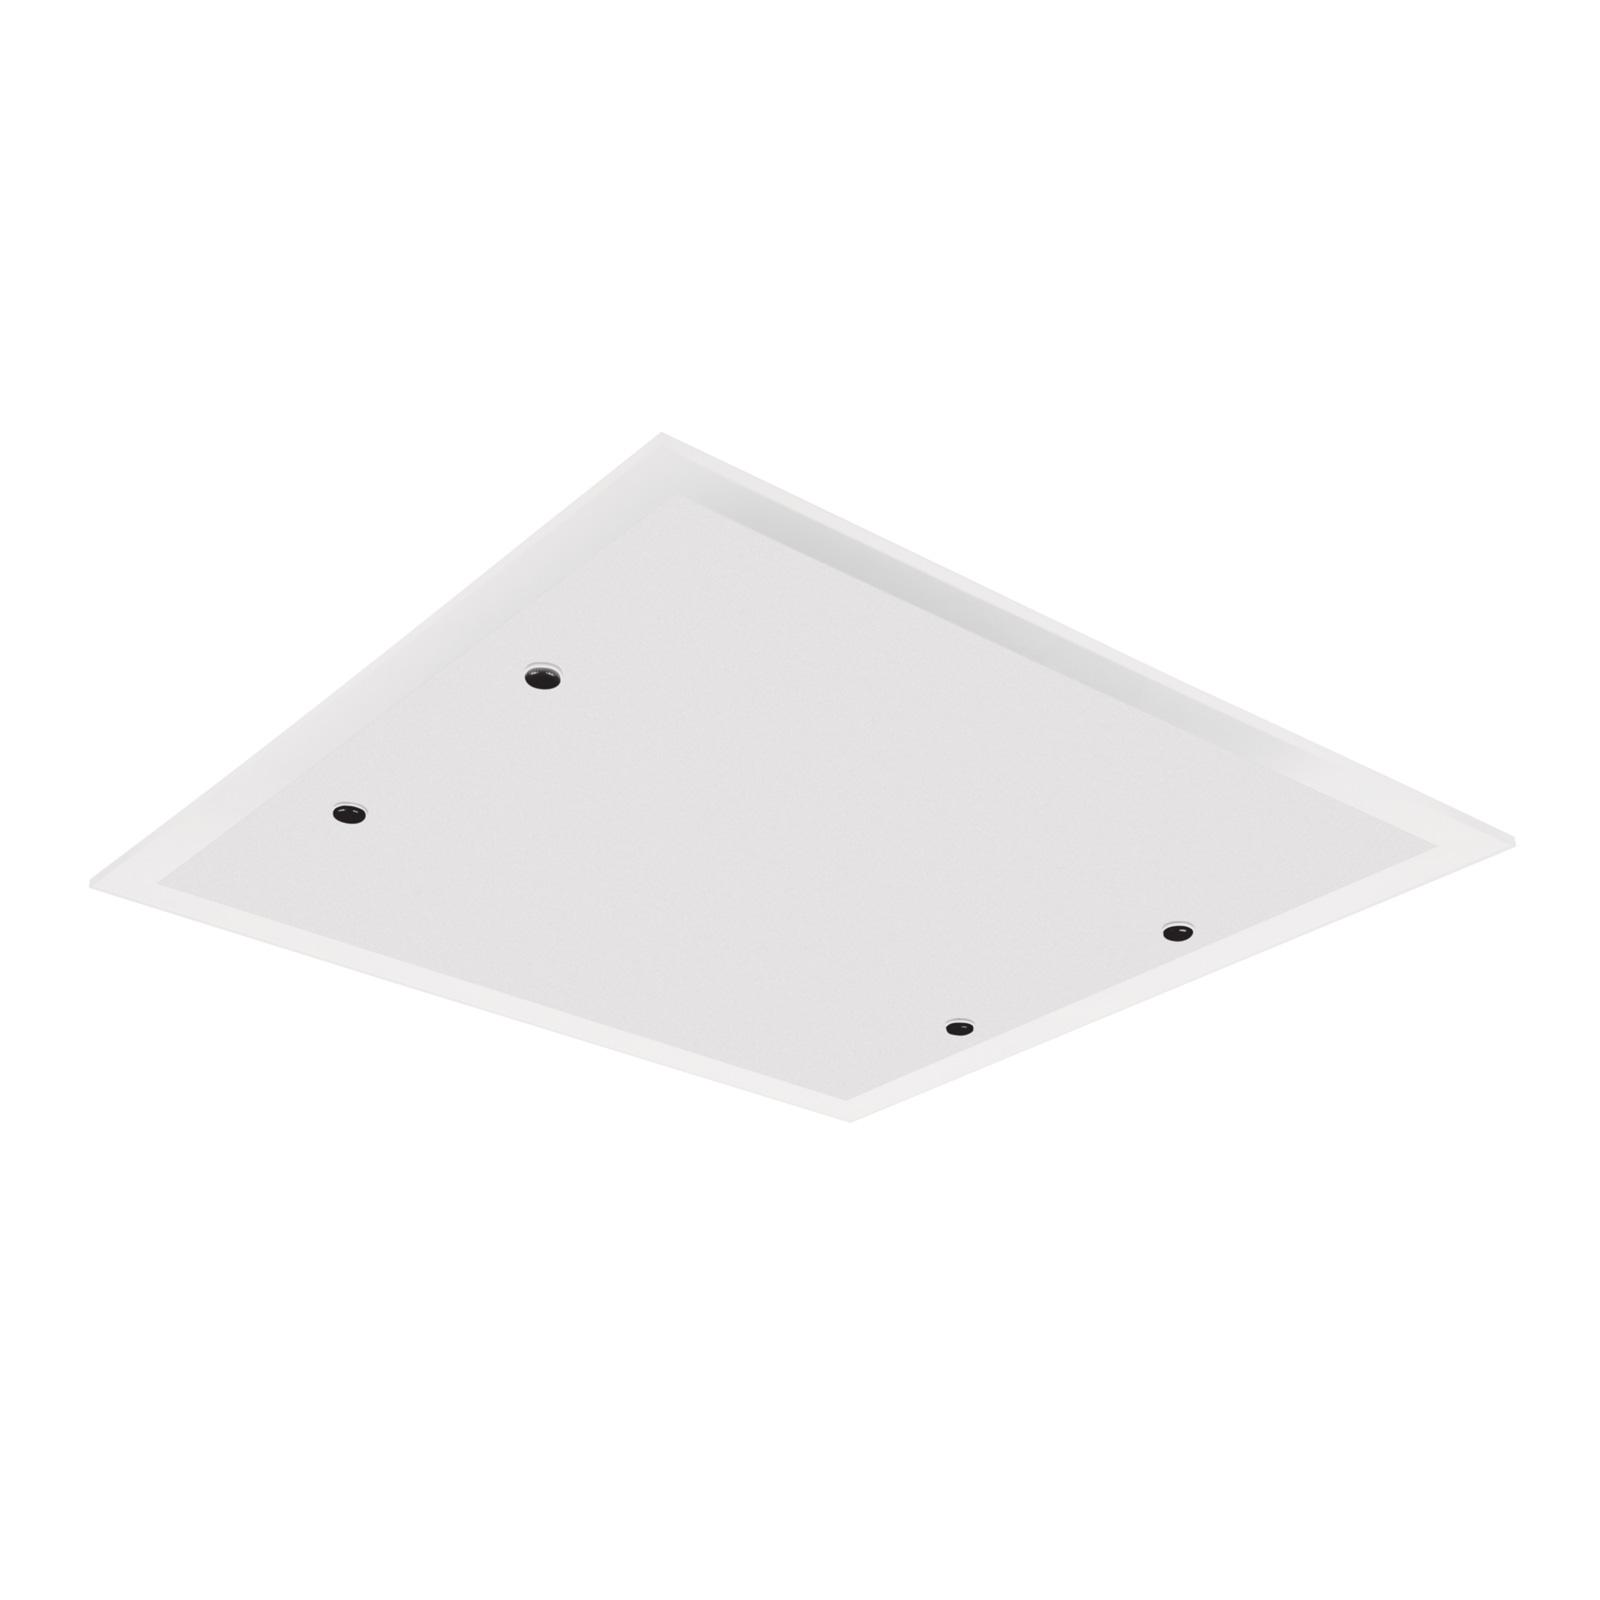 LEDVANCE Lunive Area LED-taklampe 30 cm, 4 000 K